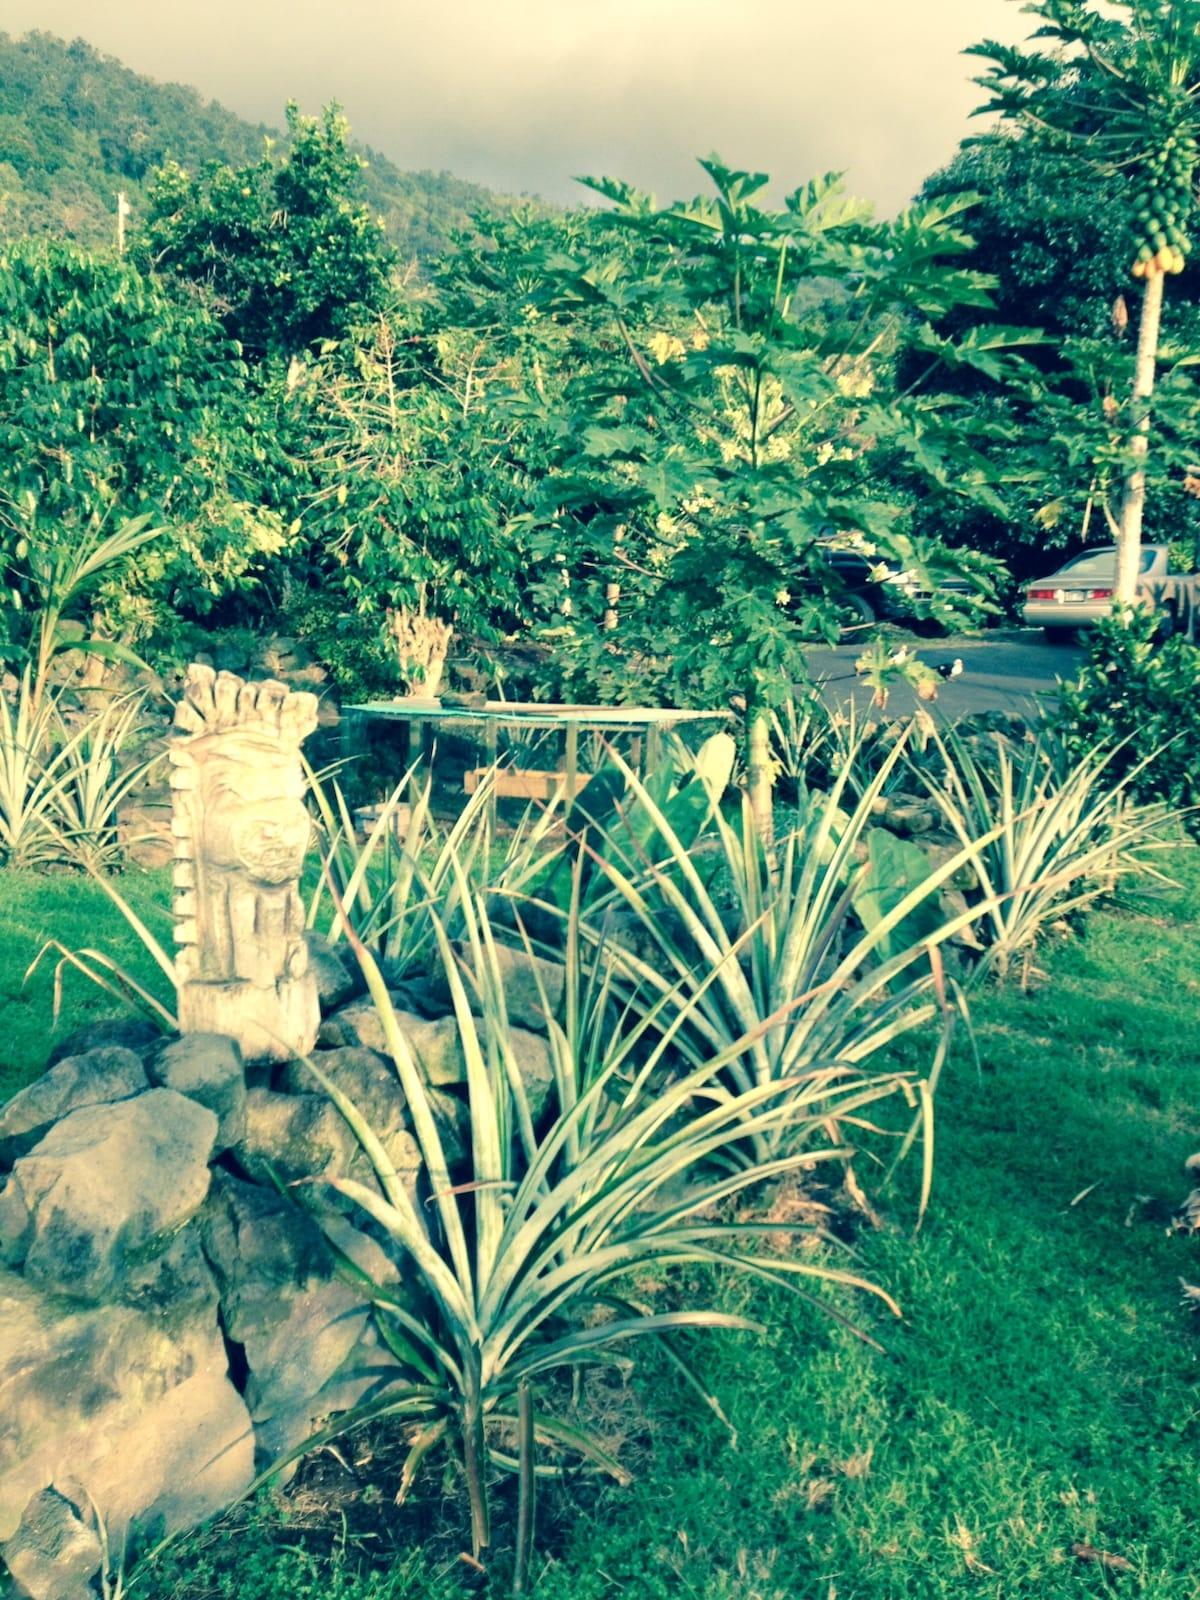 Farm garden area - pineapples & coffee trees